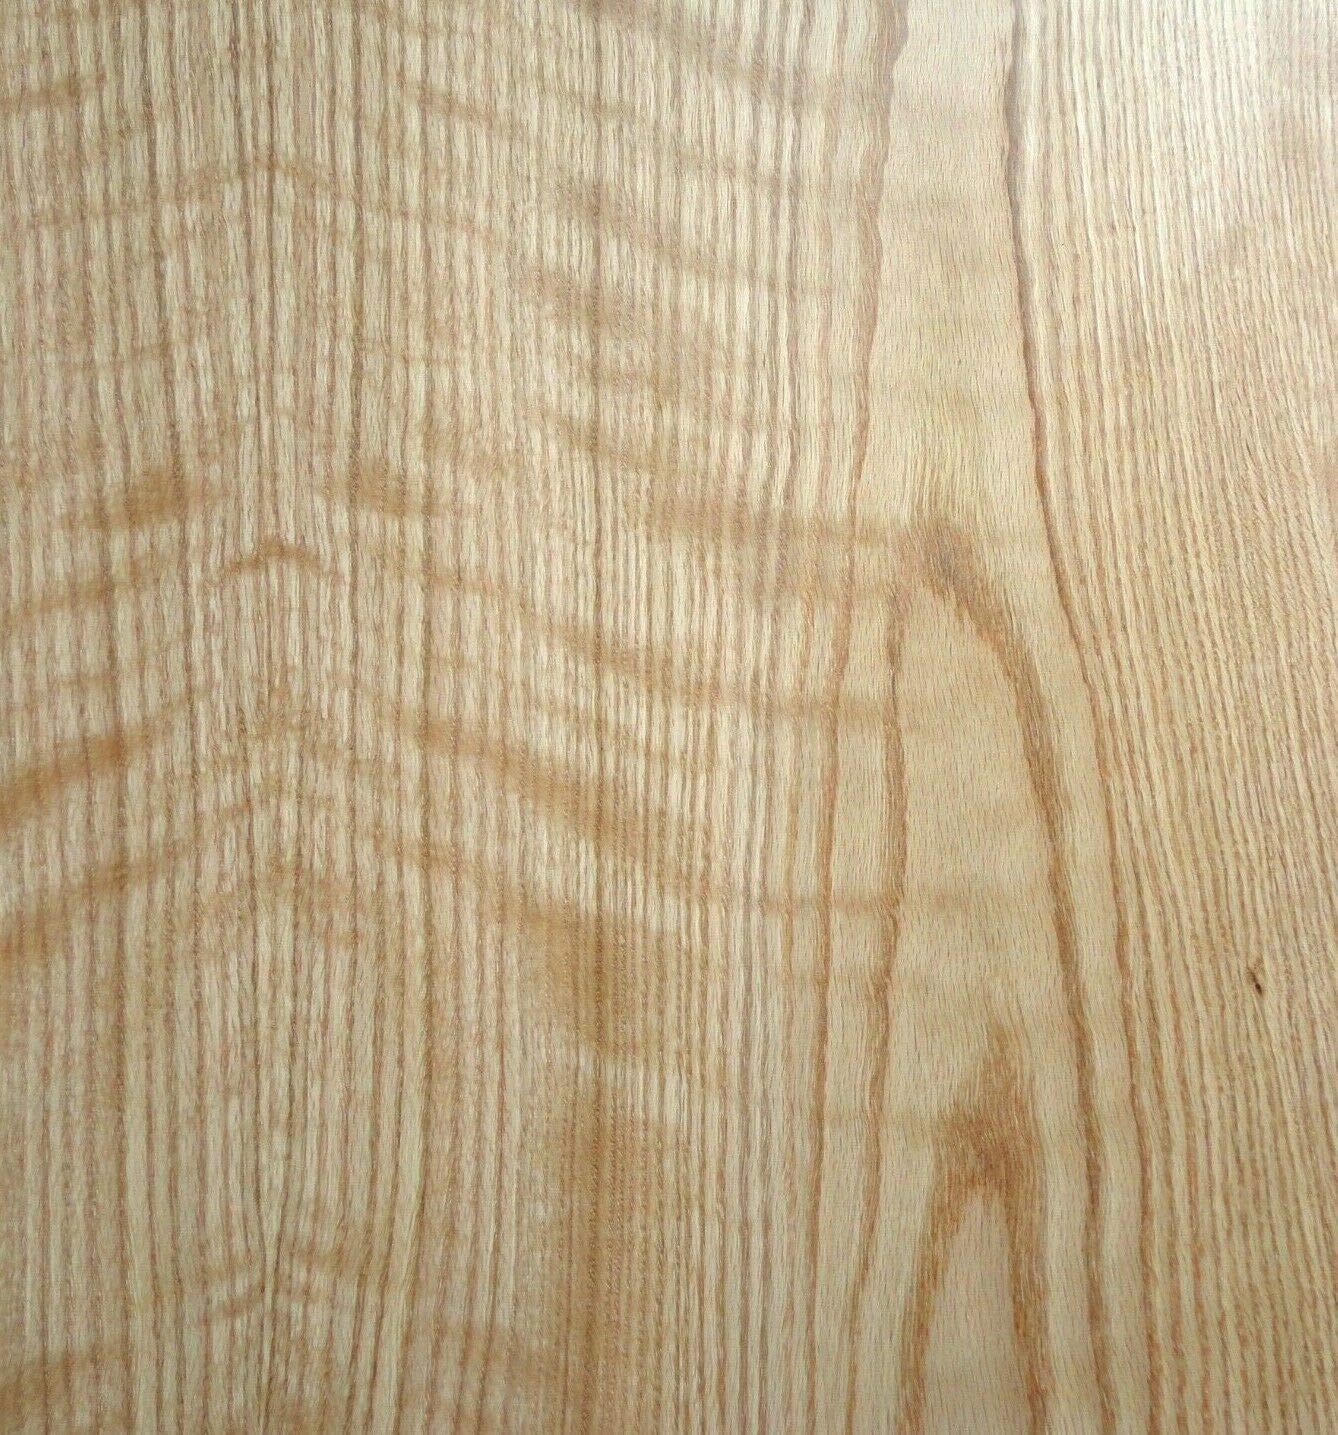 Red Oak Tiger Figure Flame wood veneer sheet 48'' x 96'' with paper backer 1/40''